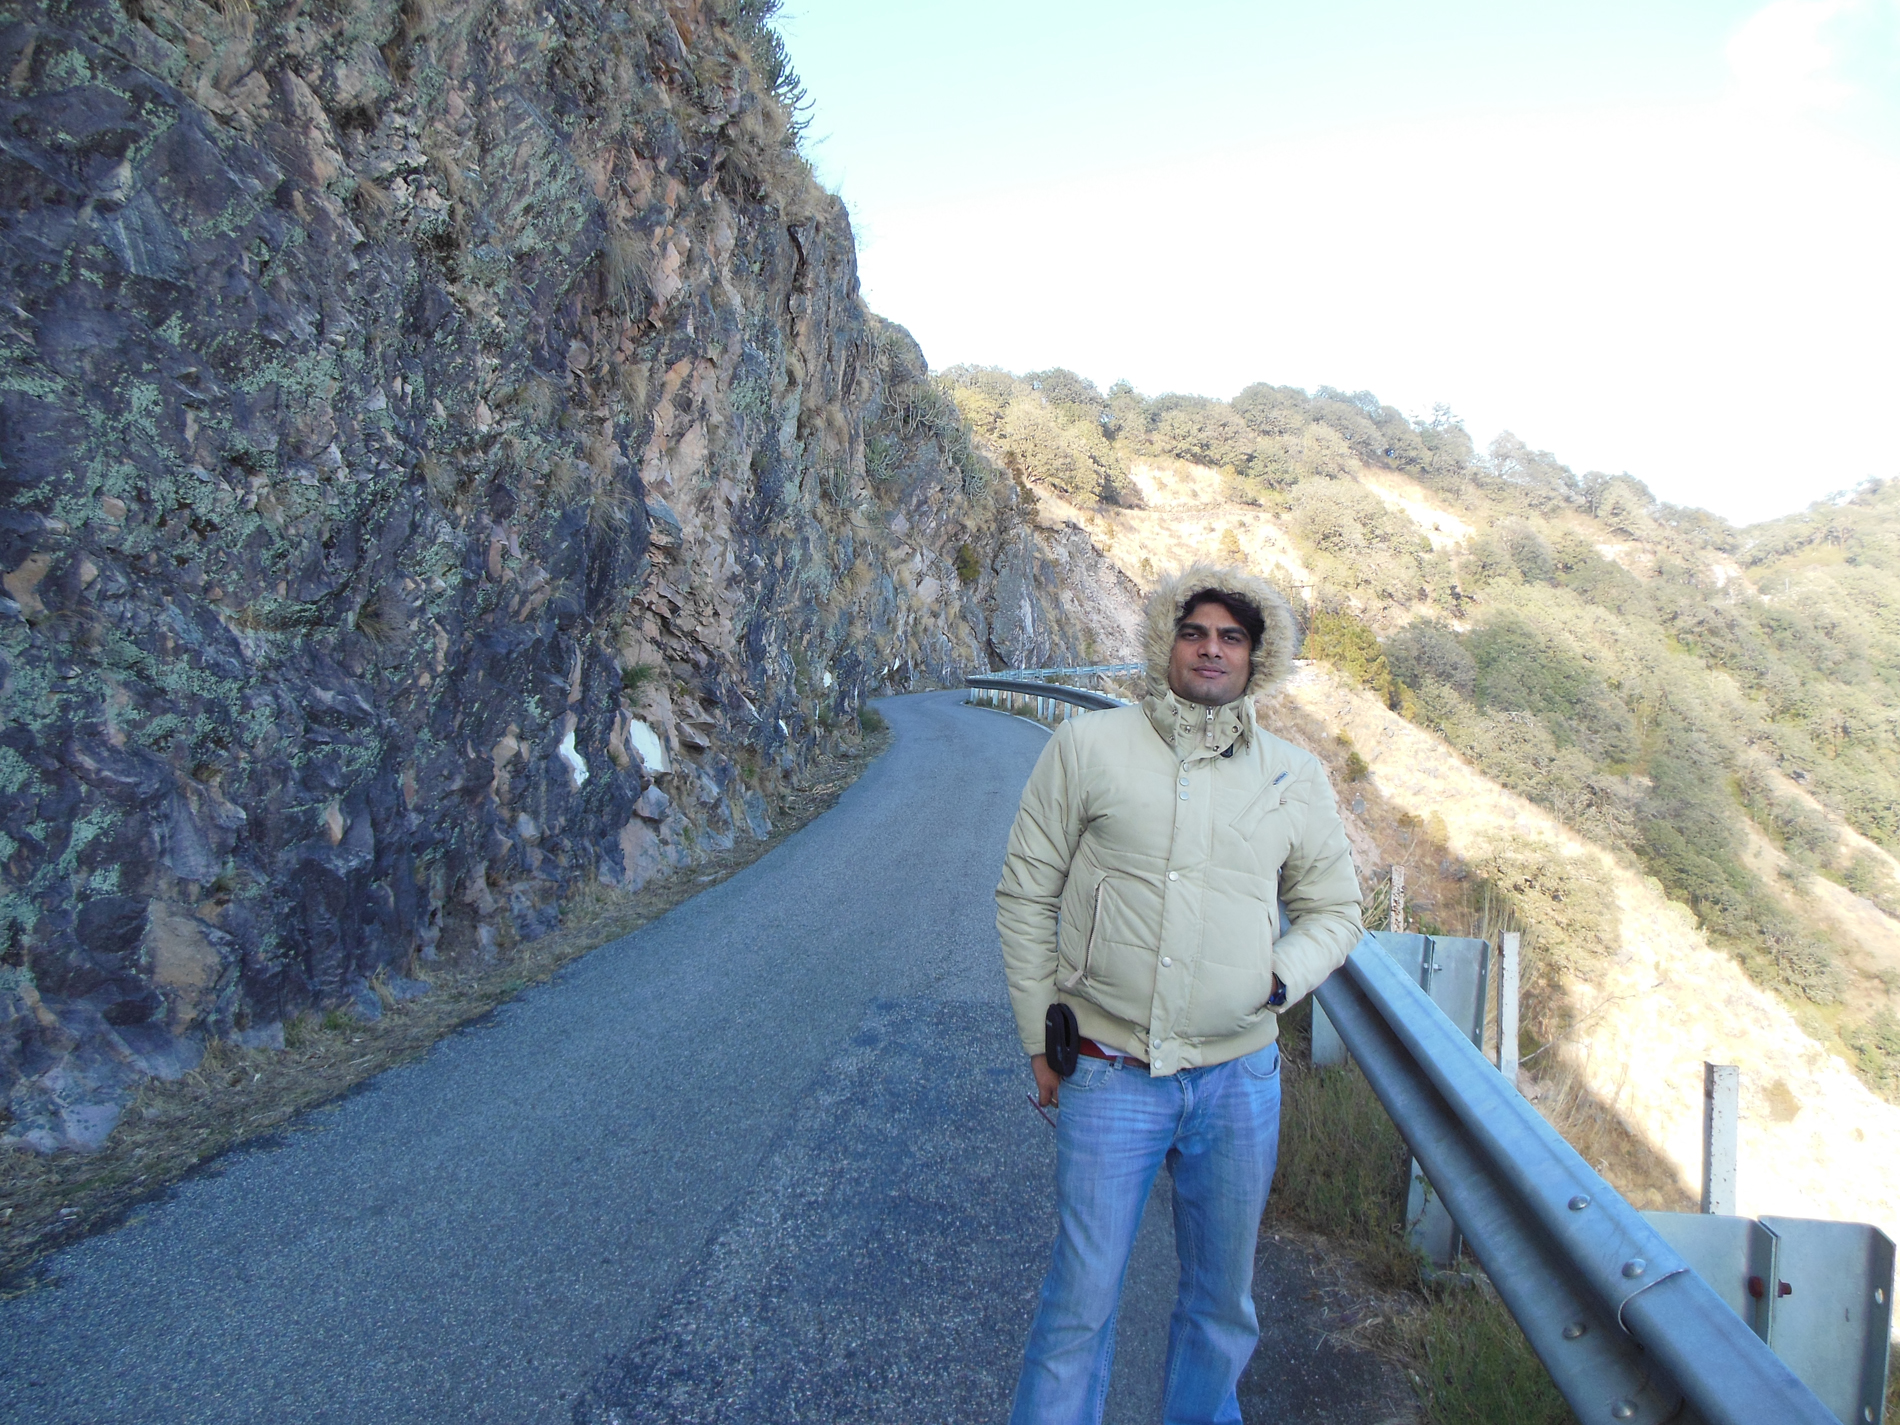 Happy Ghumakkari....Travelling is good.